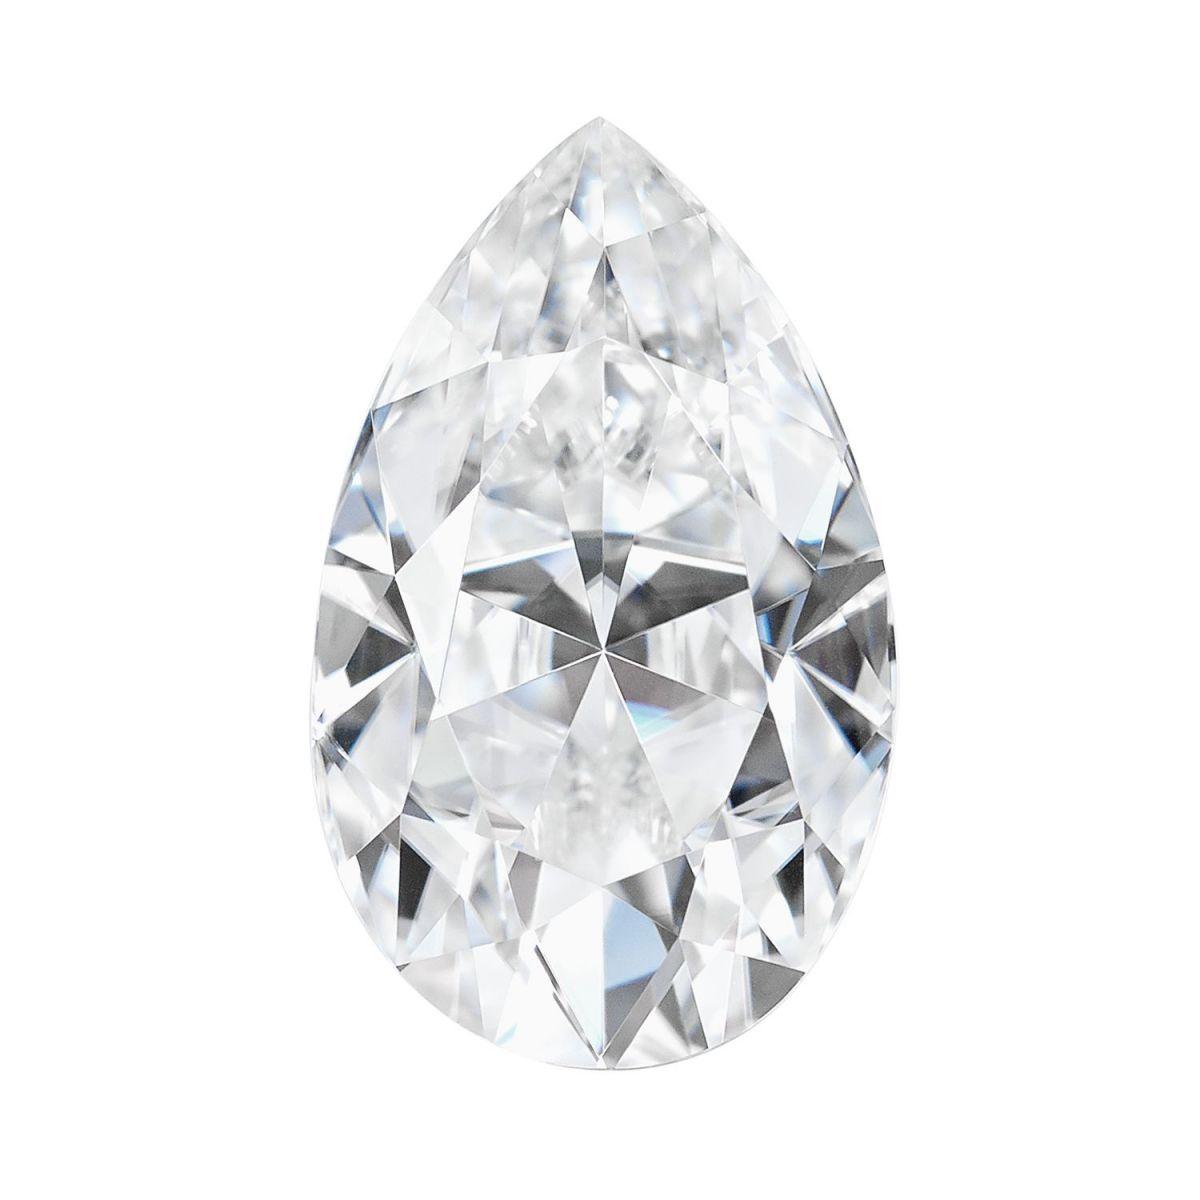 https://www.loveandpromisejewelers.com/media/catalog/product/cache/feefdef027ccf0d59dd1fef51db0610e/p/e/pear_moissanite_image_2.jpg